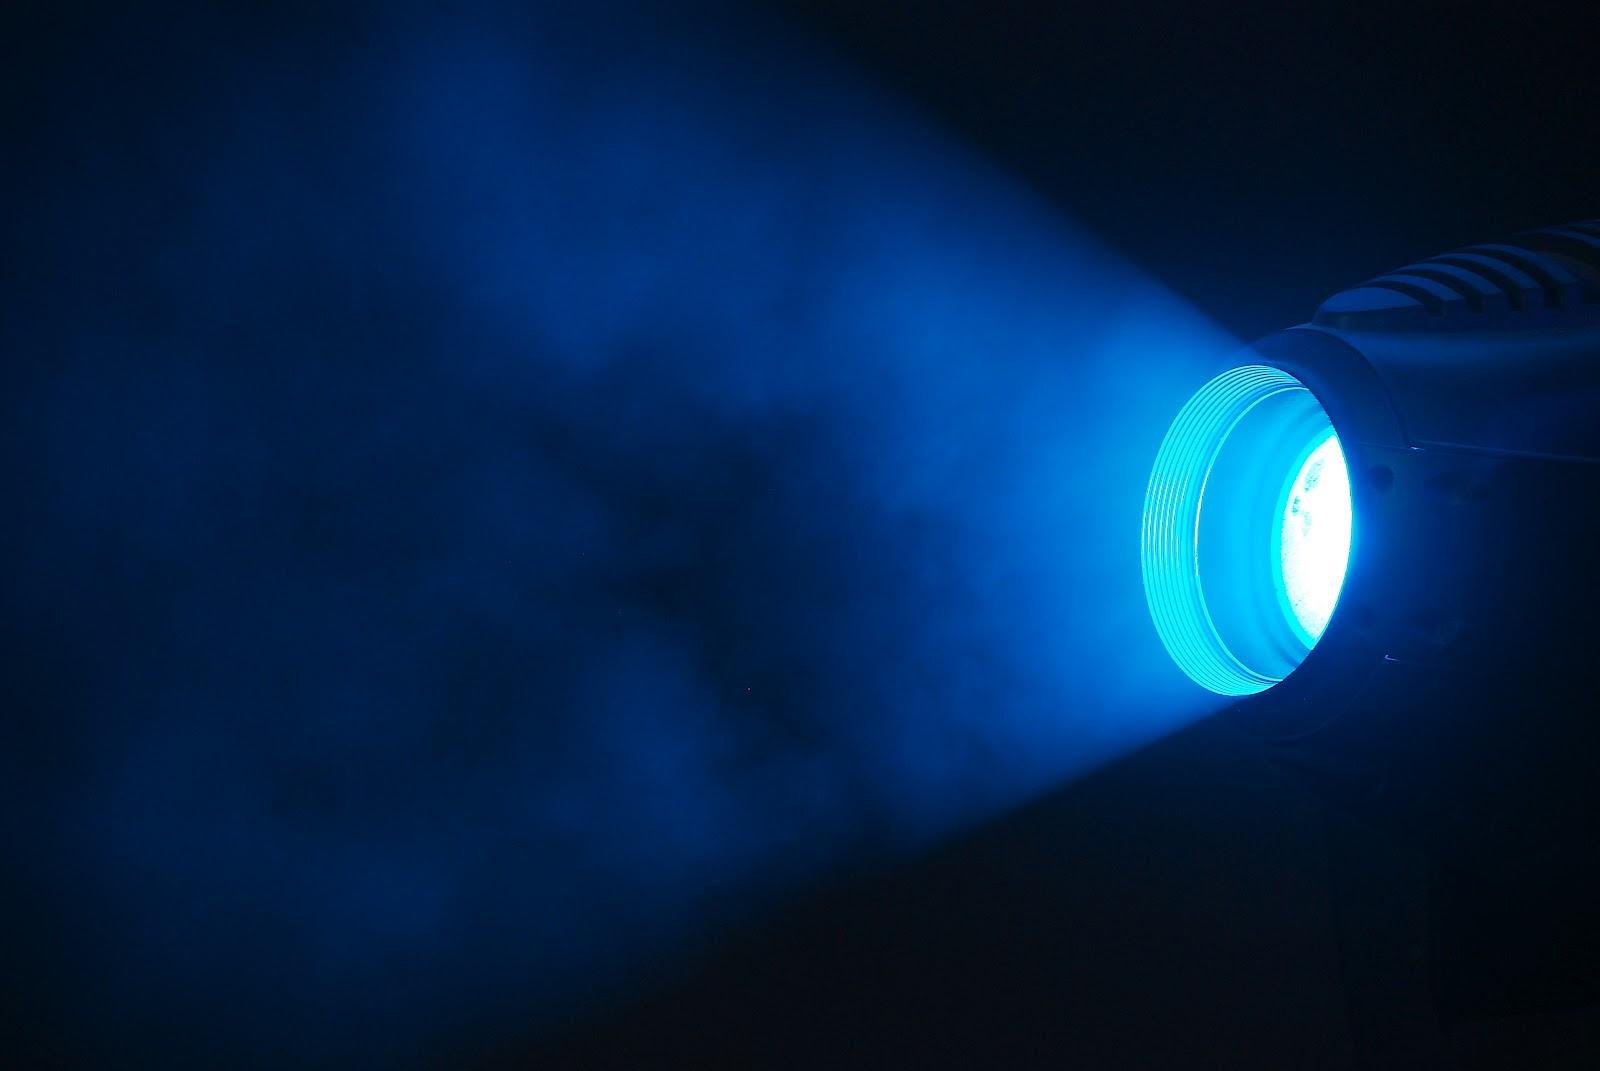 A lamp emitting blue light.